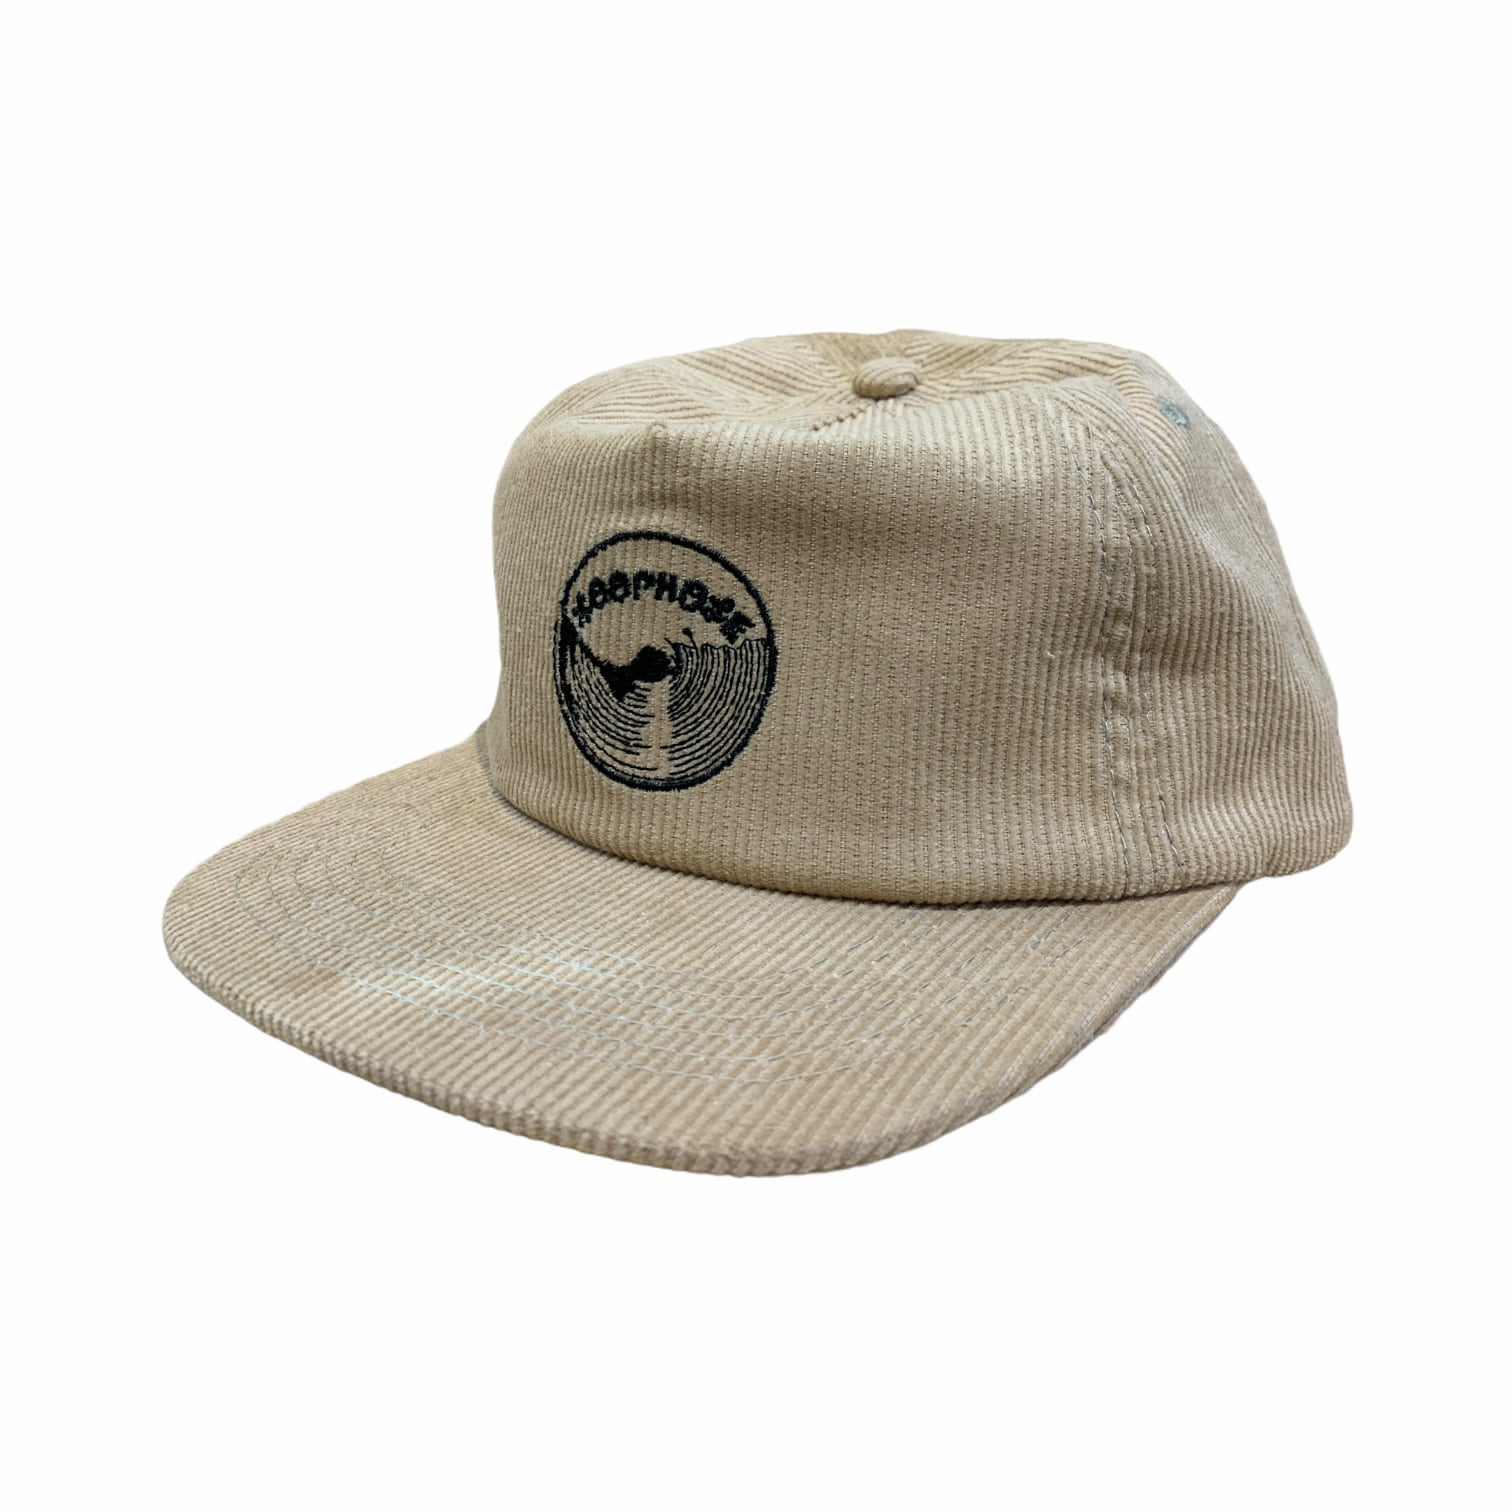 LOOPHOLE WHEELS 【CORDUROY CAP】